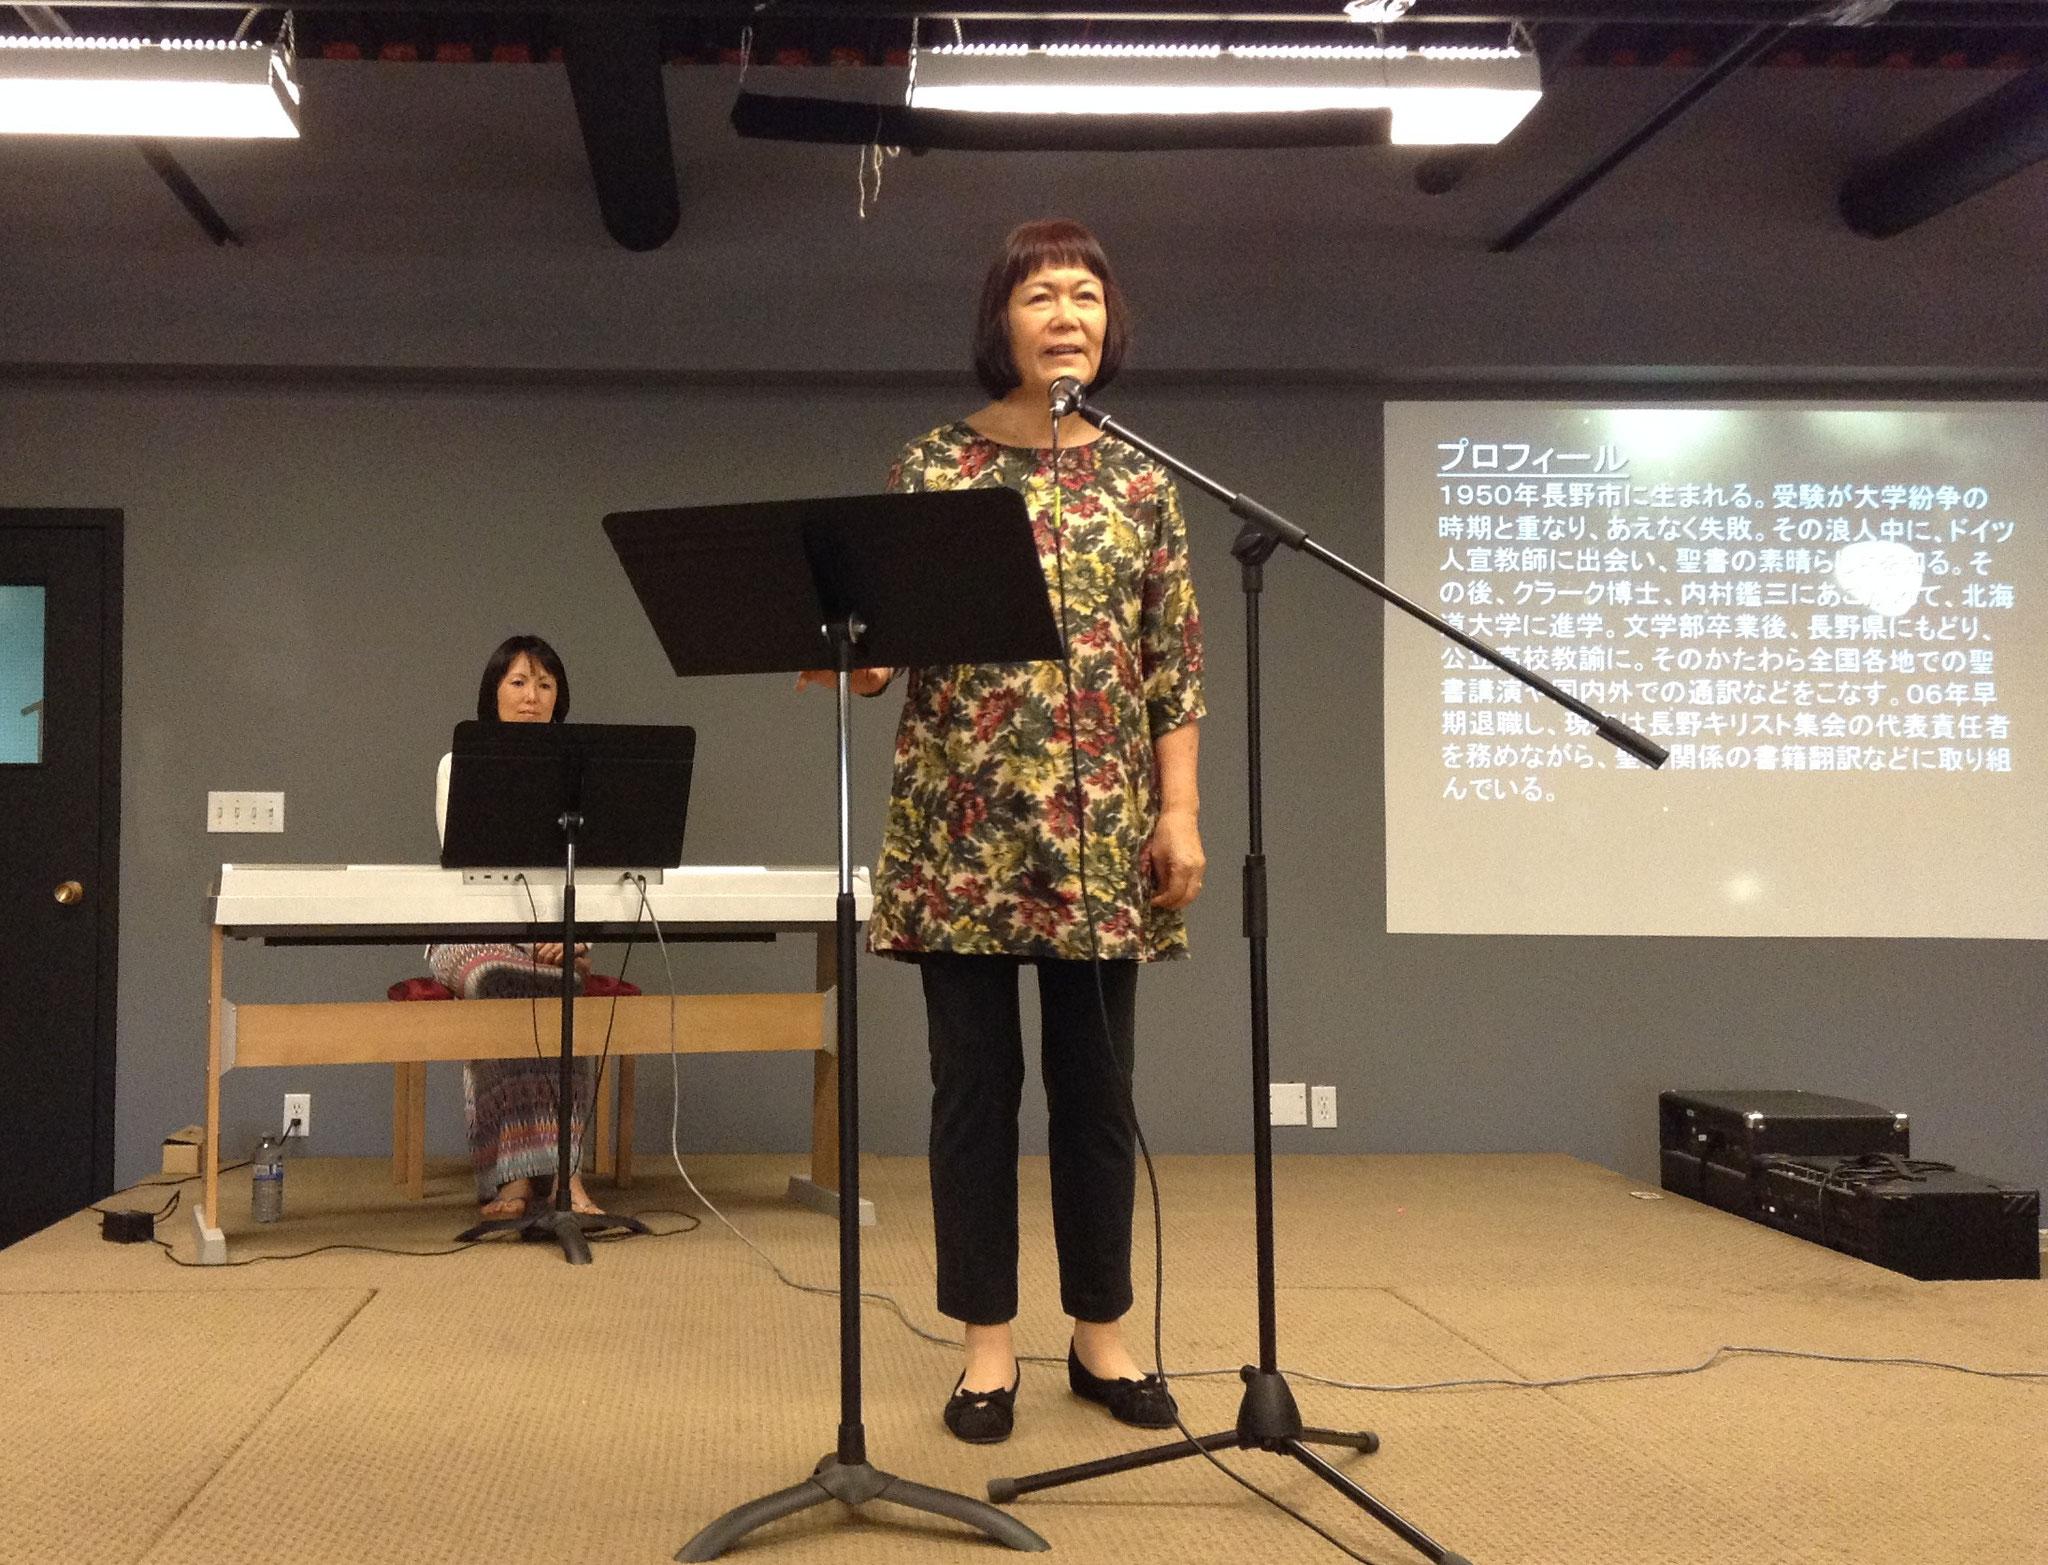 Keiko Ozaki's special worship (Daughter Megumi on Piano)